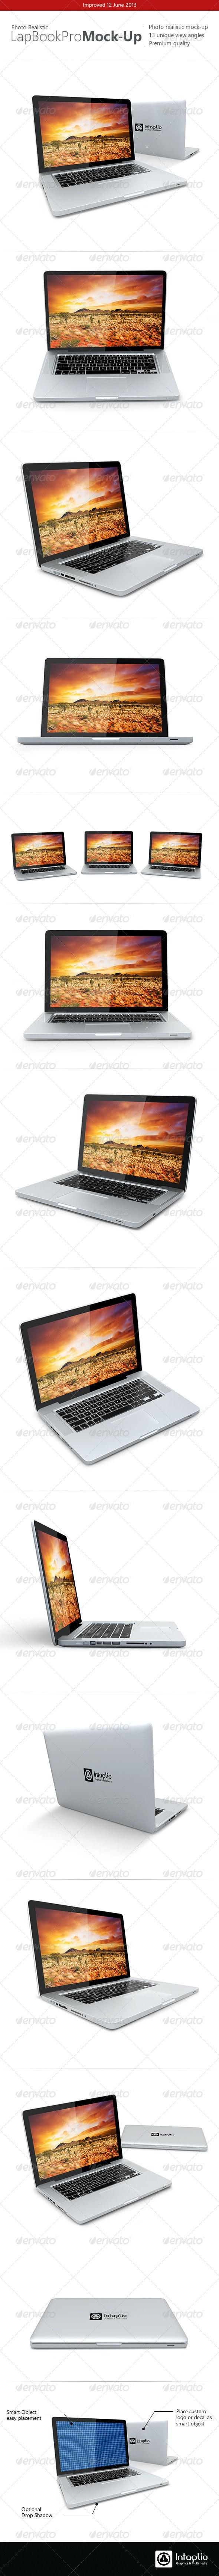 Photo-realistic Lap Book Pro Mock-Up - Laptop Displays